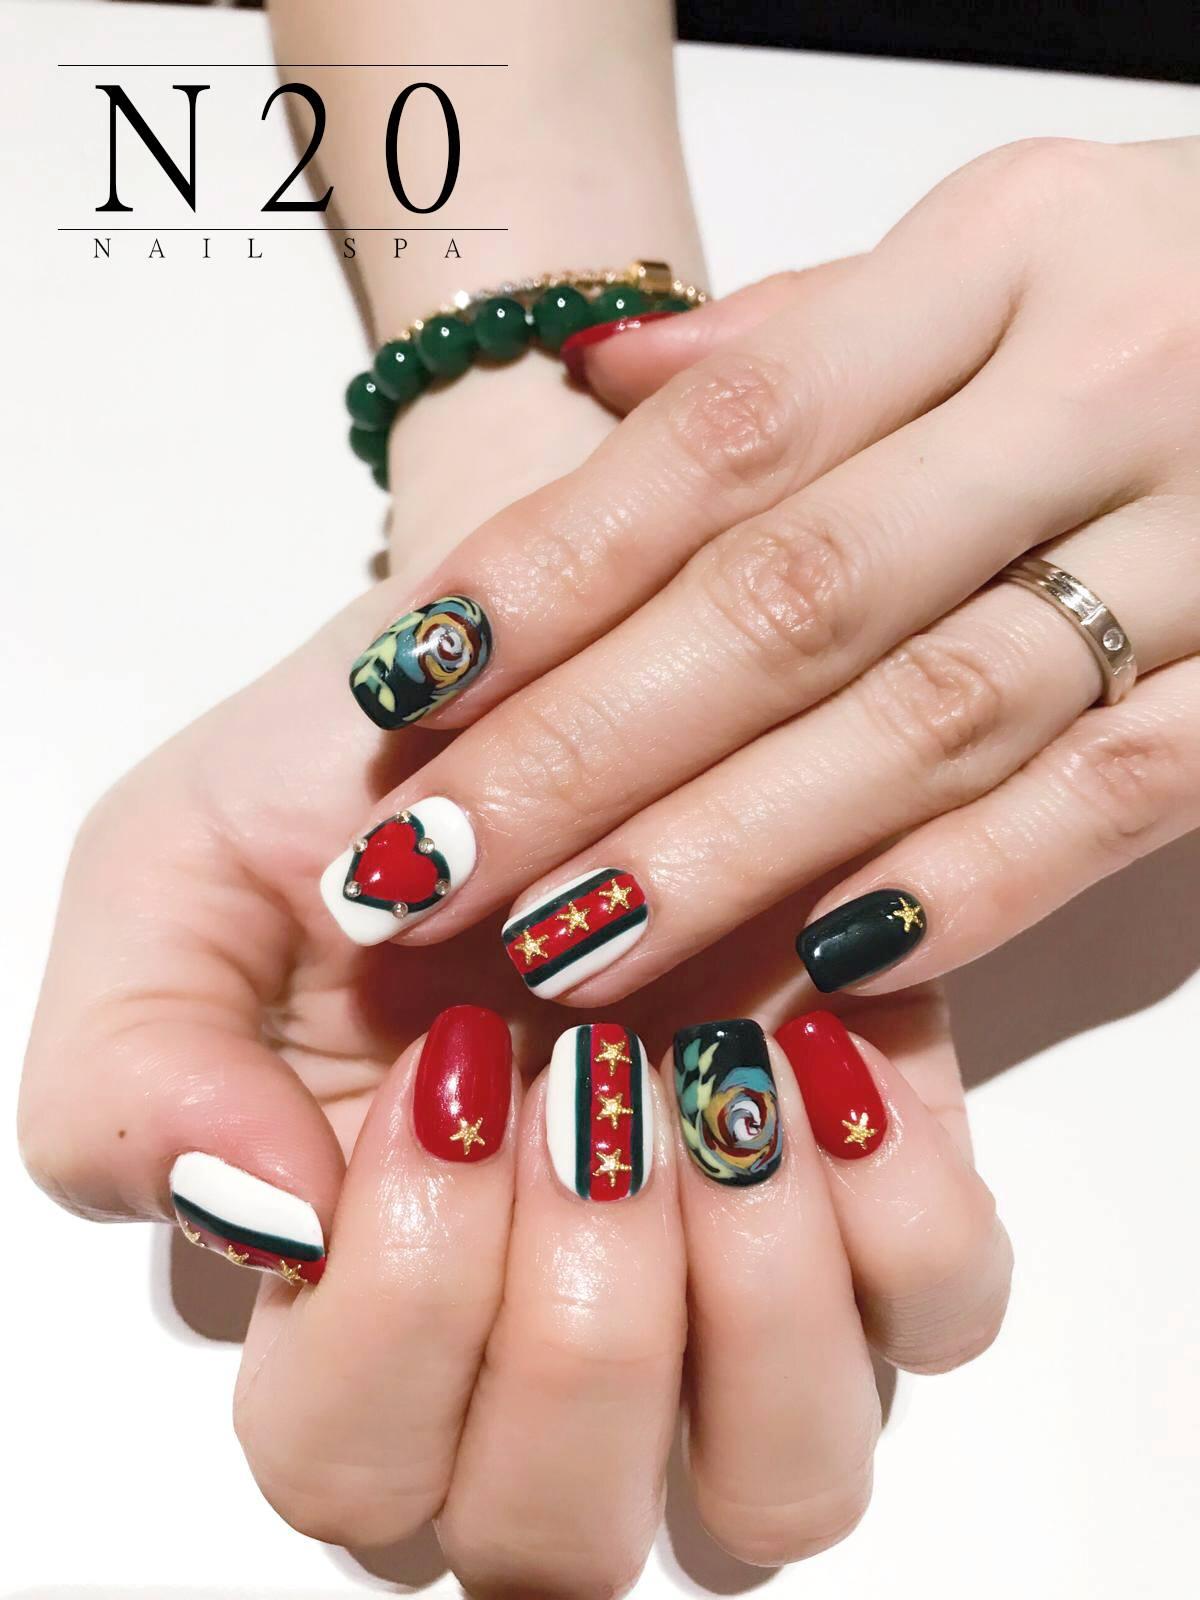 Gold Stars, Red Heart, Jewel-studded Manicure Nail Art